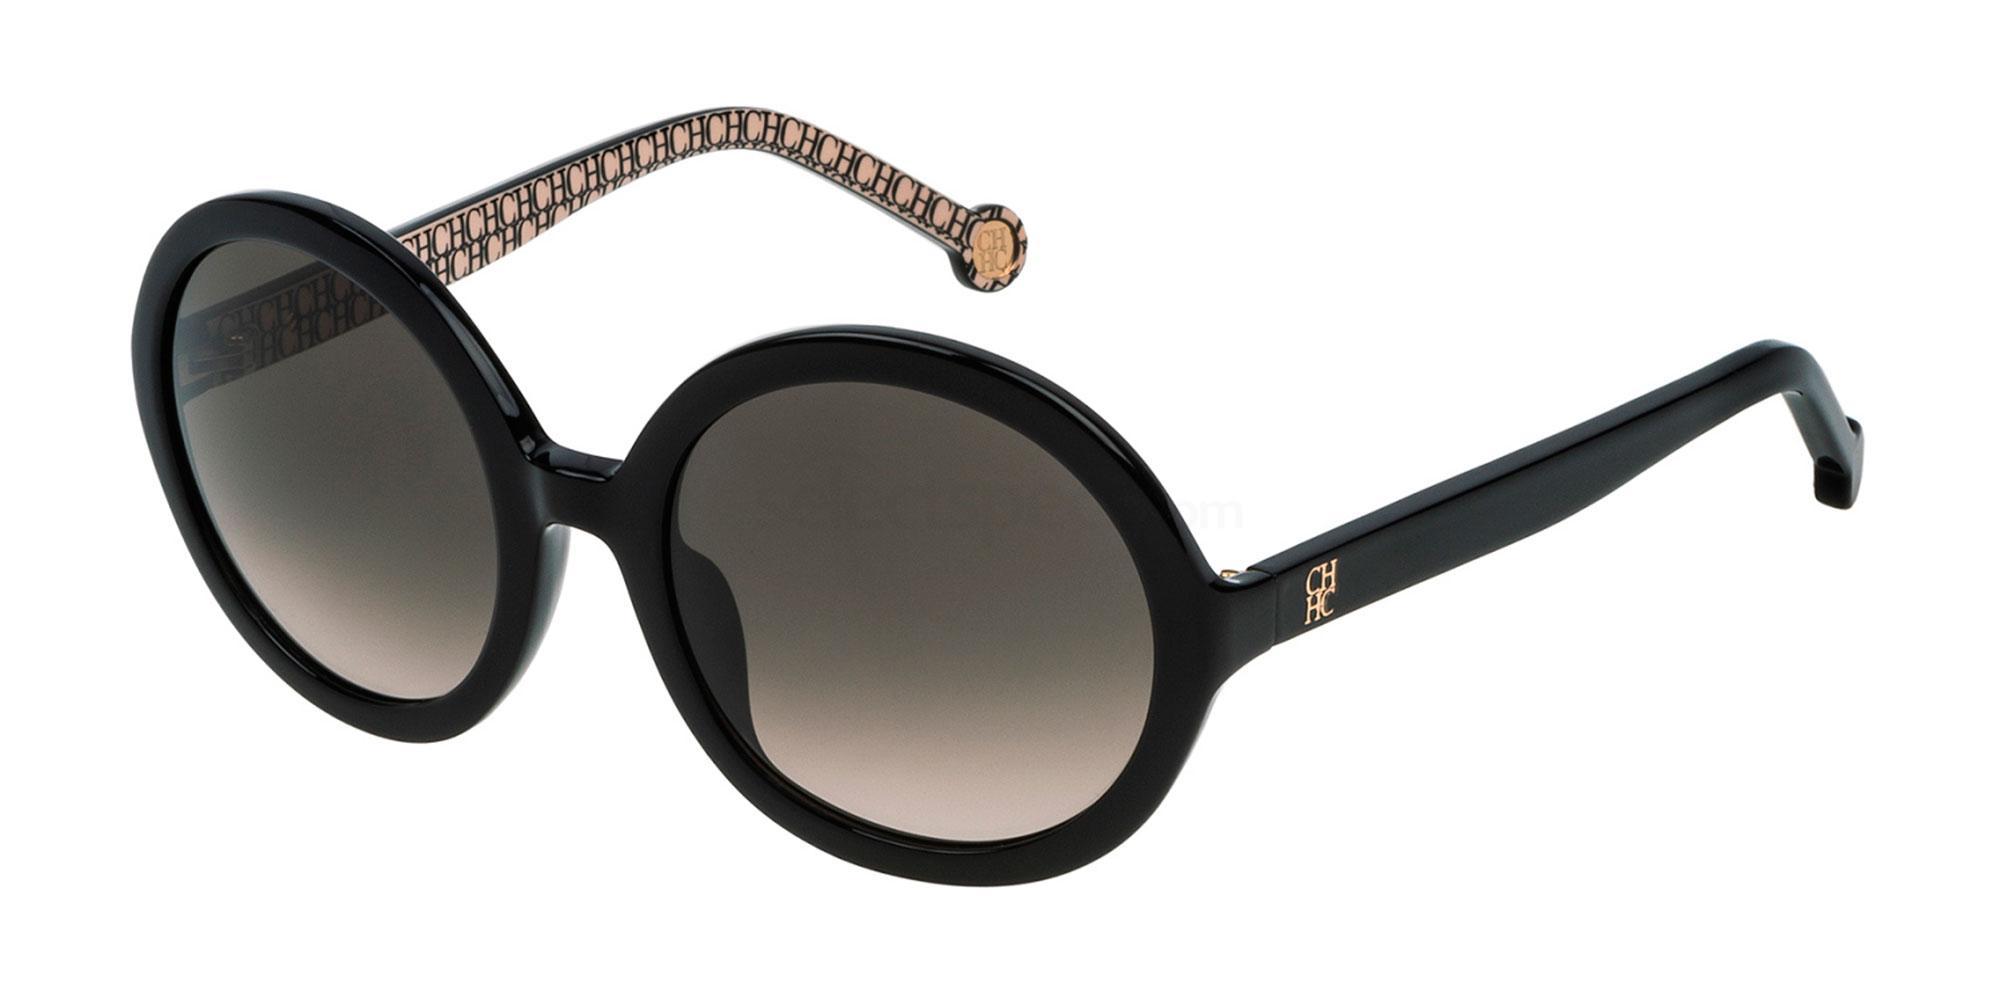 CH Carolina Herrera SHE696 Sunglasses